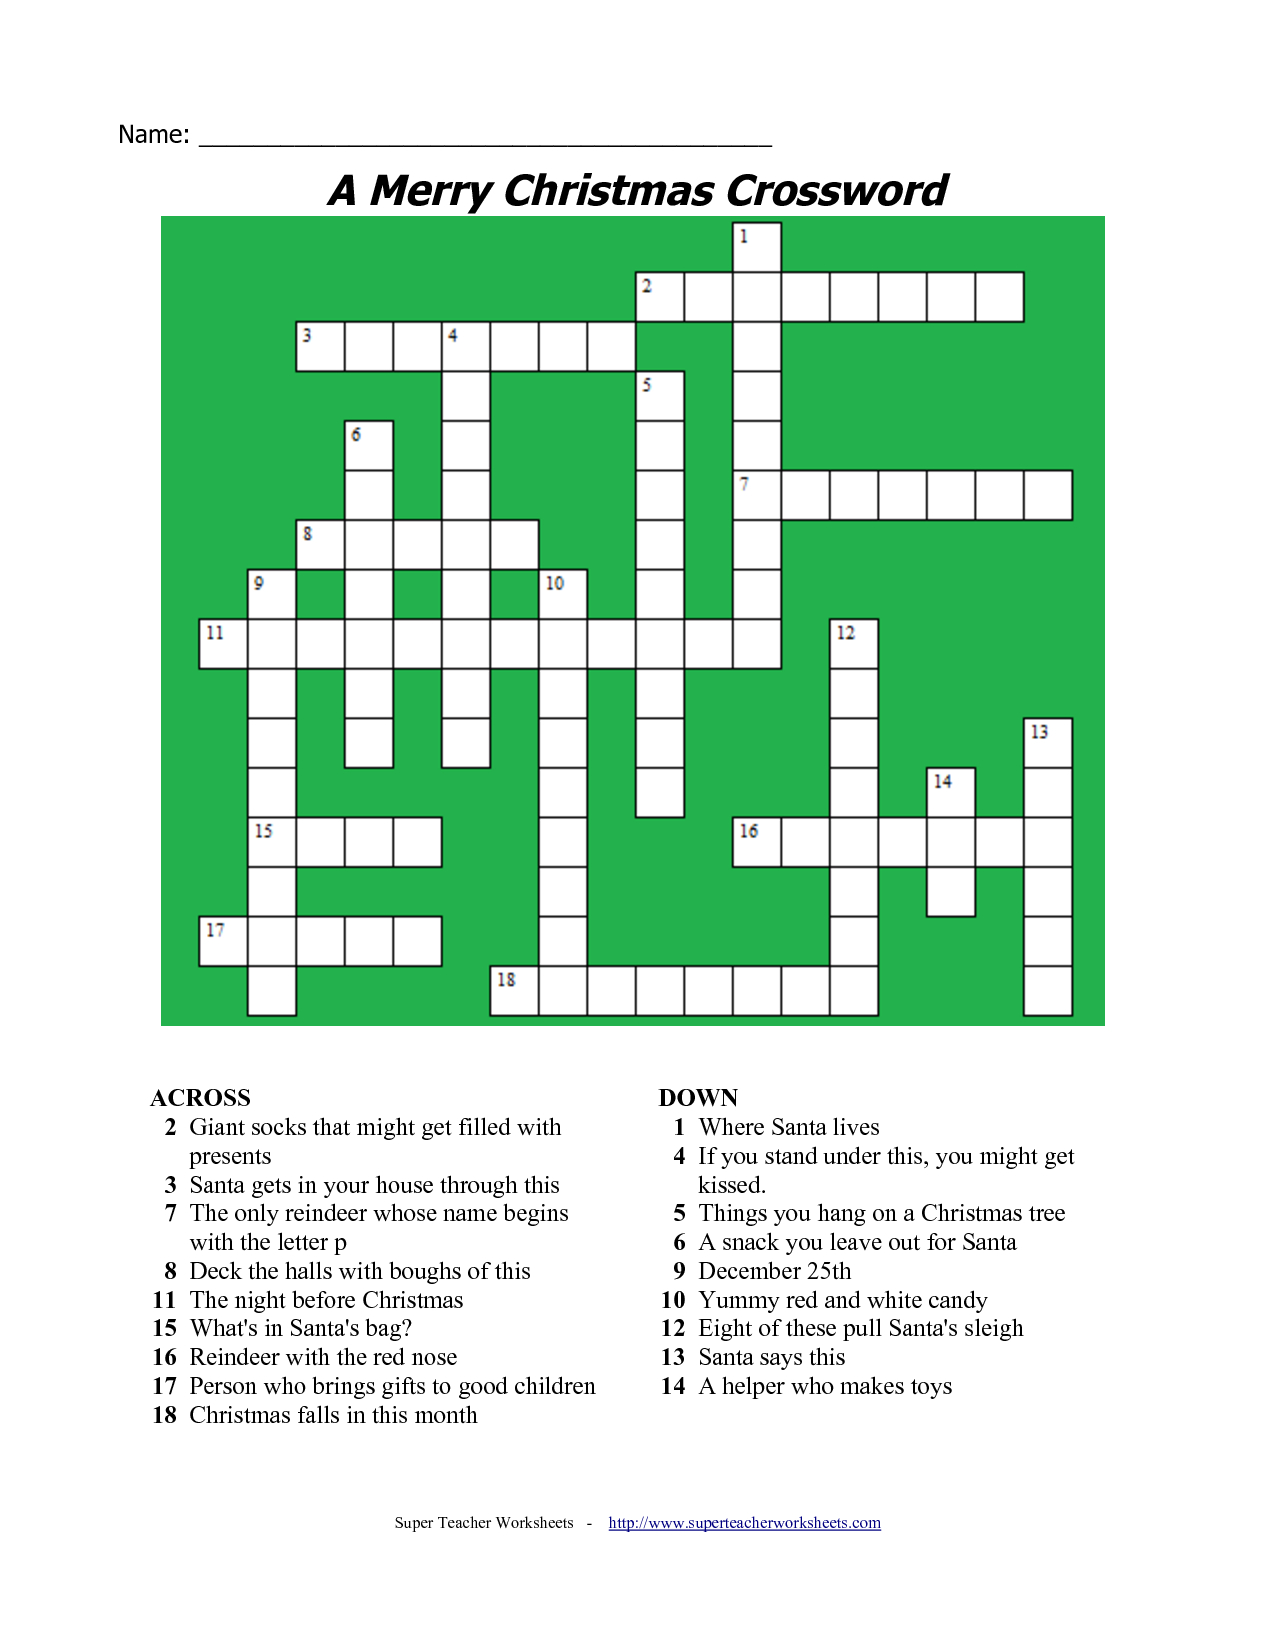 20 Fun Printable Christmas Crossword Puzzles | Kittybabylove - Printable Holiday Crossword Puzzles